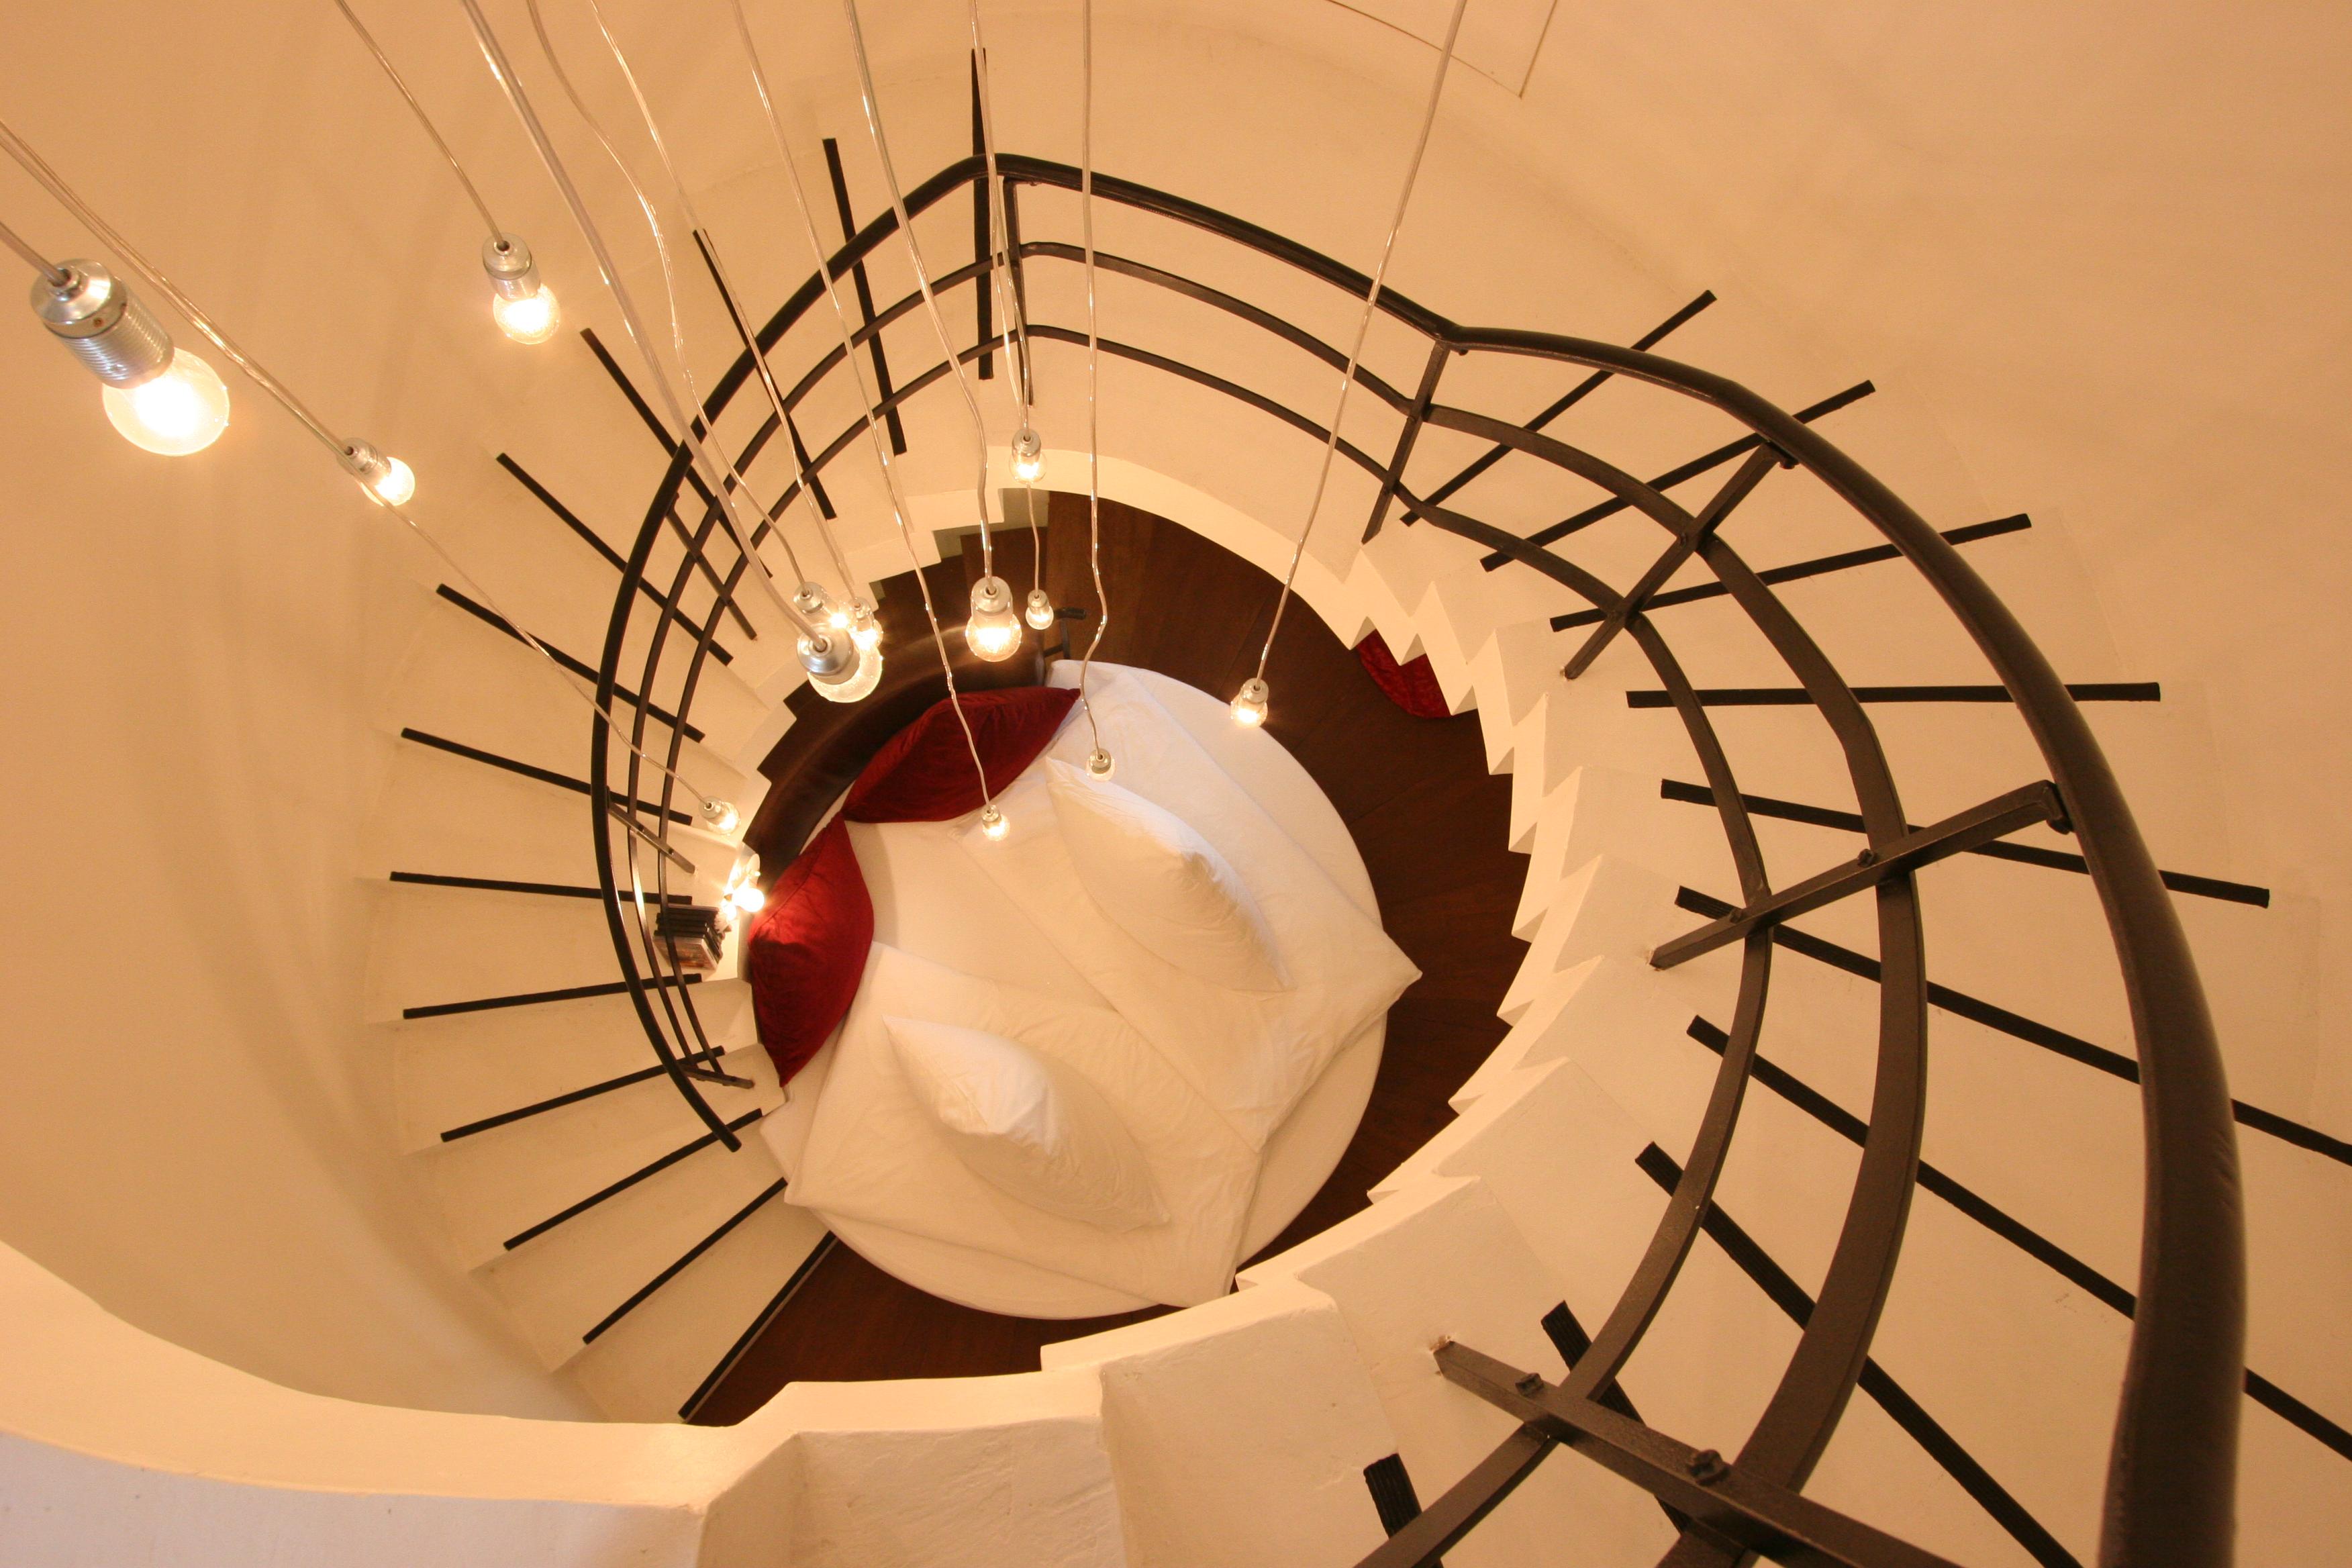 360 modernes design im lotsenturm usedom for Designhotel usedom